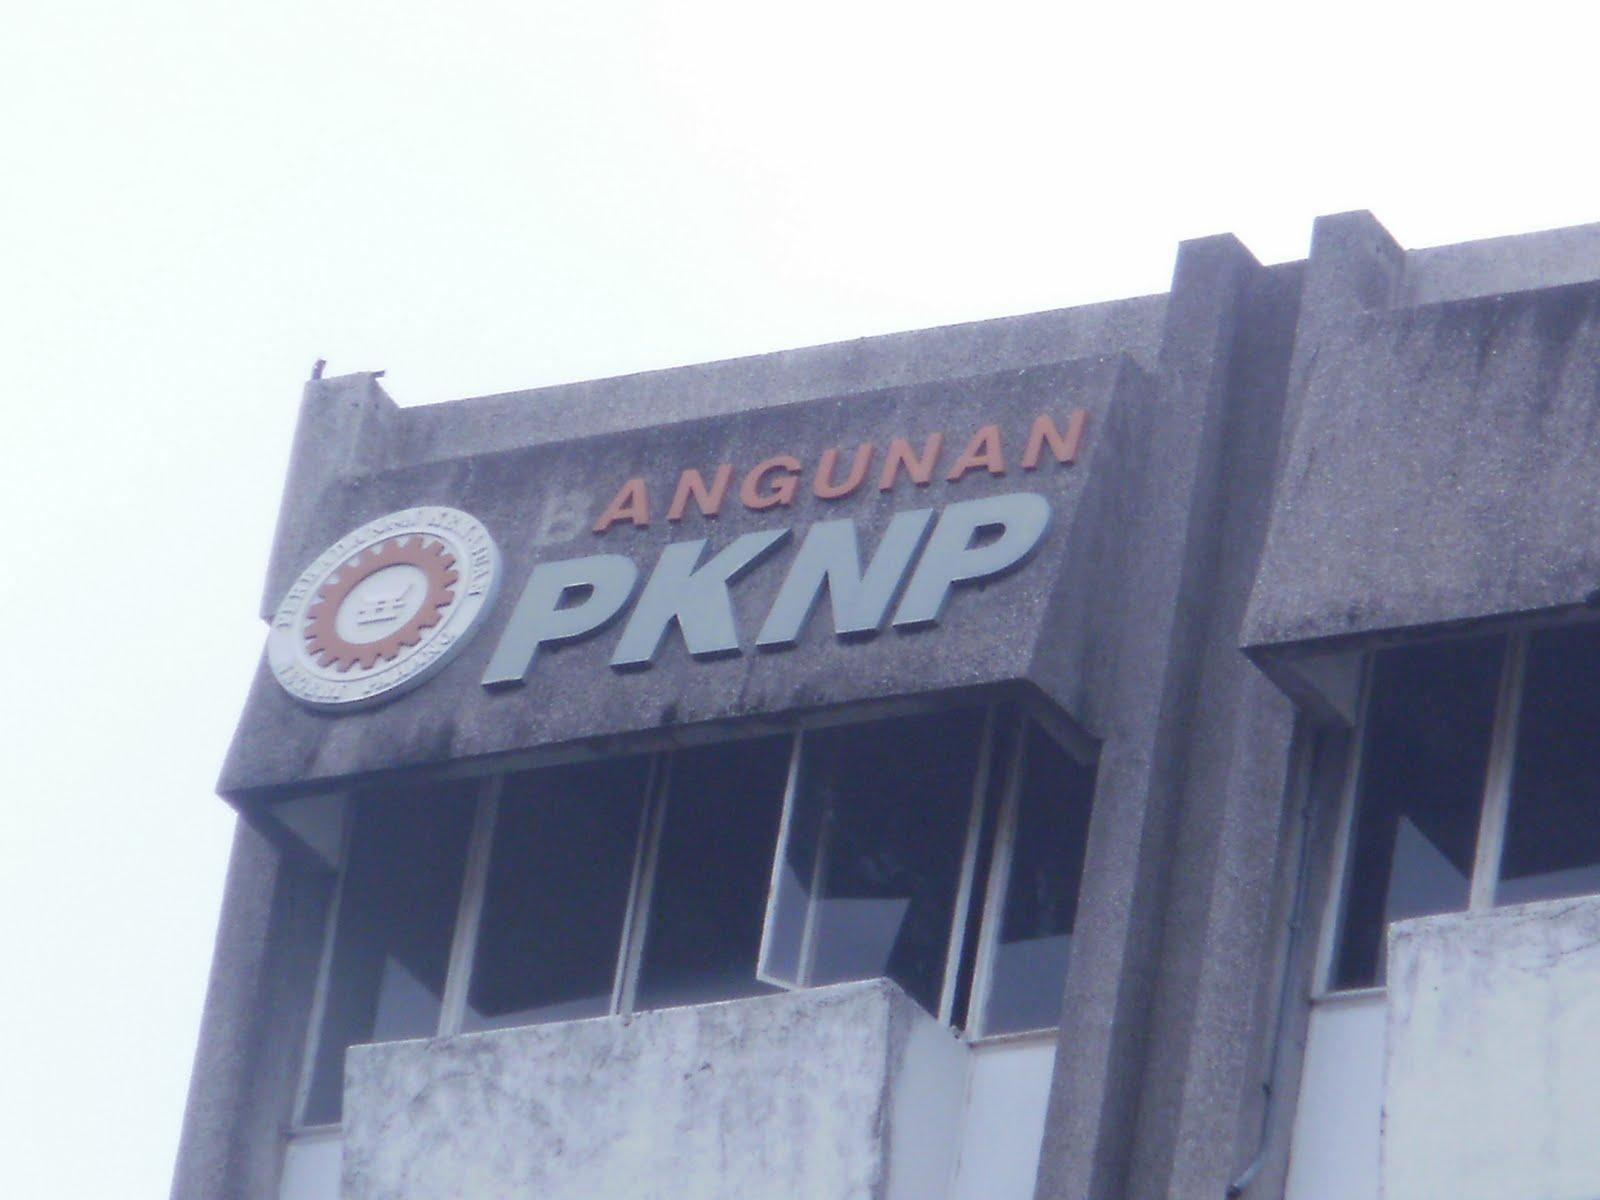 Lambang Negeri Pahang